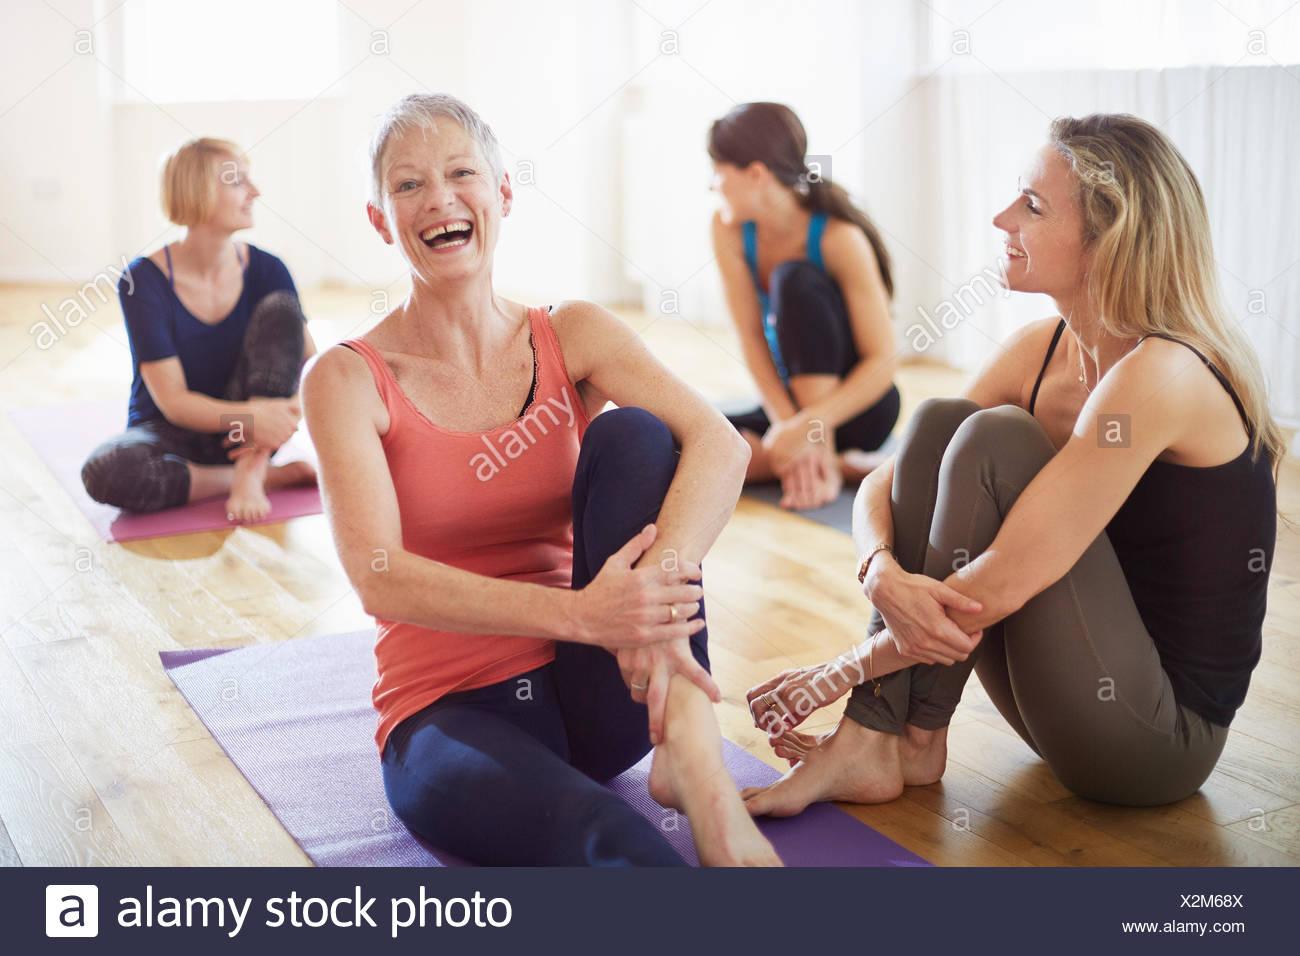 Vier Frauen sitzen am Boden im Pilates-Klasse Stockbild